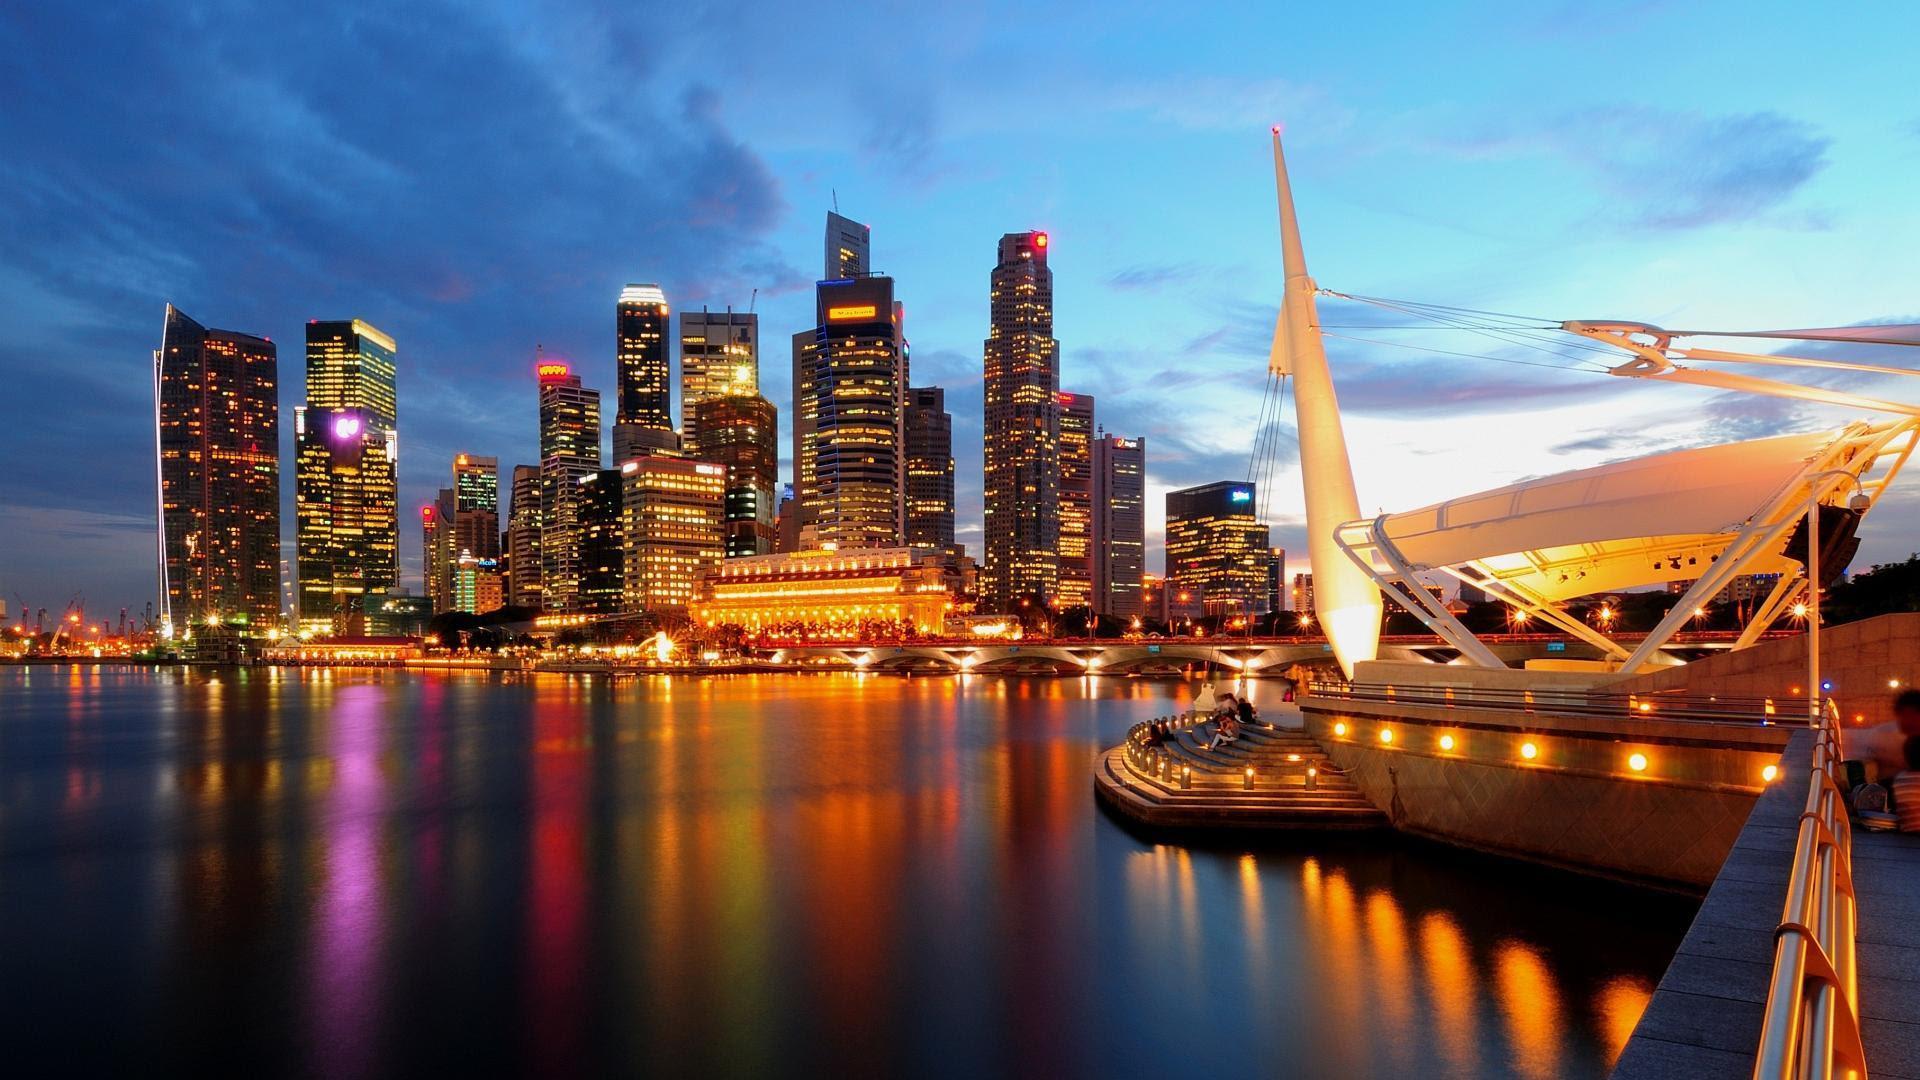 Beautiful City Lights At Night wallpaper | travel and ...